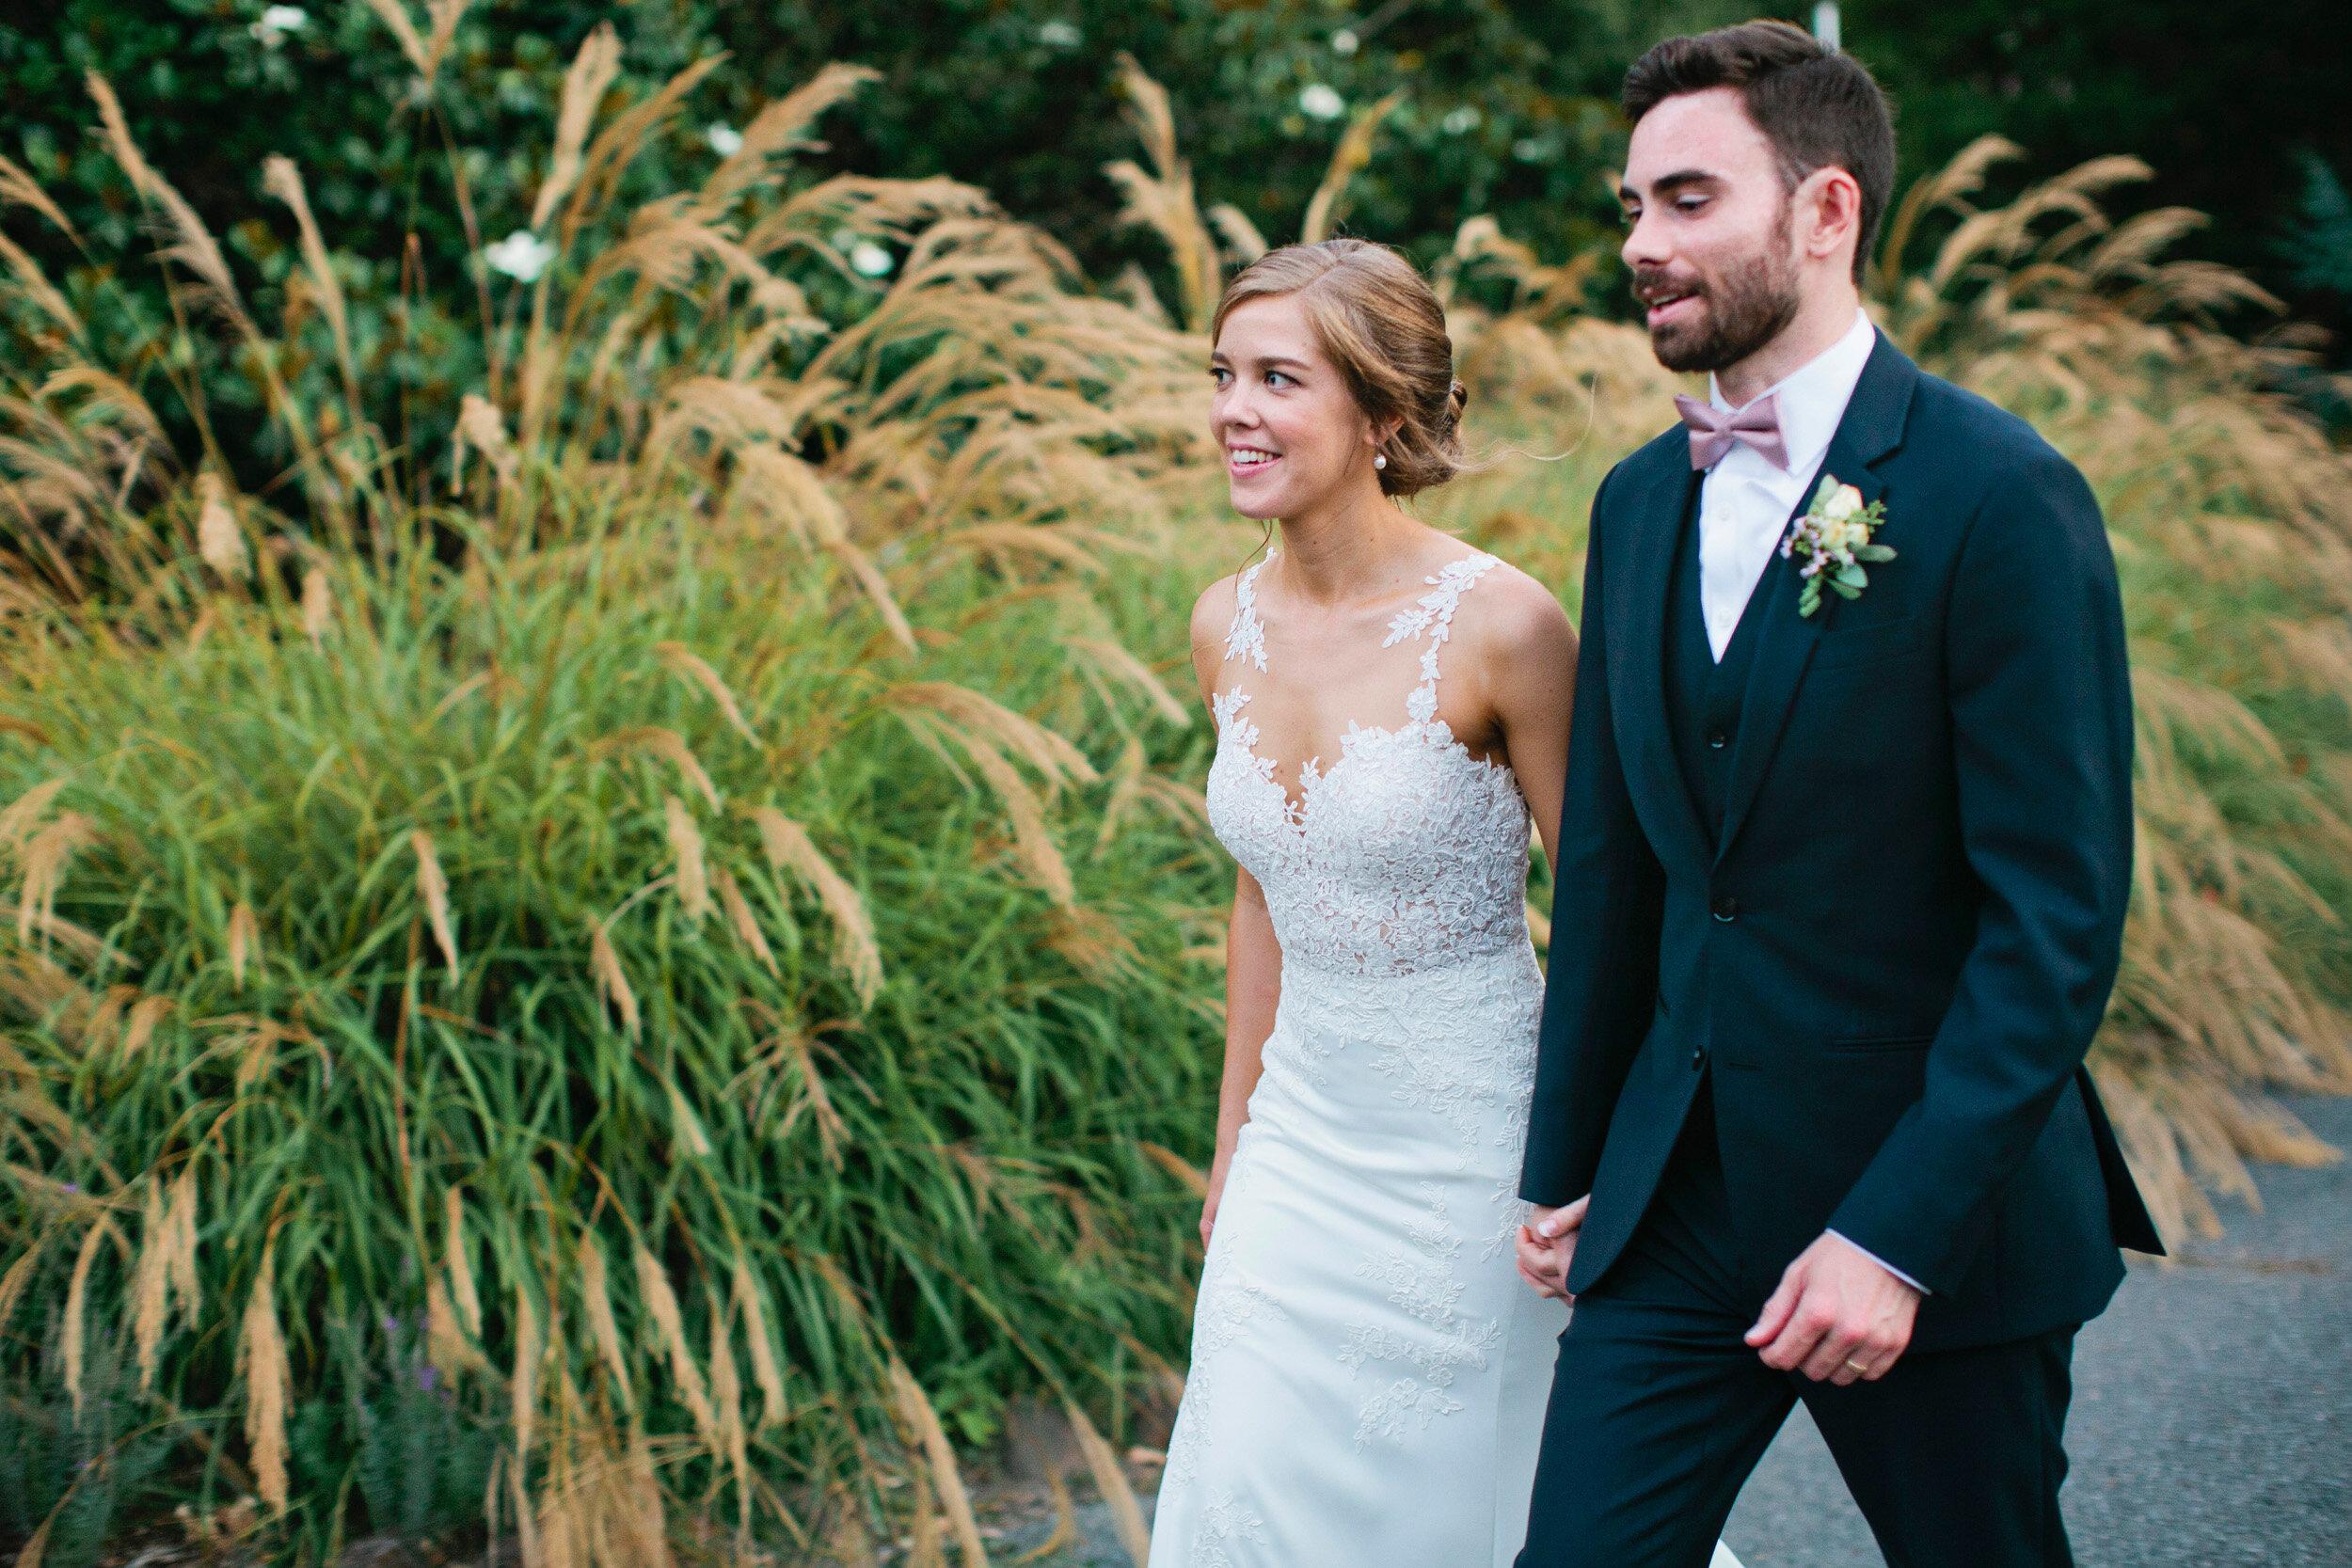 Marin-Art-Garden-Center-Wedding-52.JPG